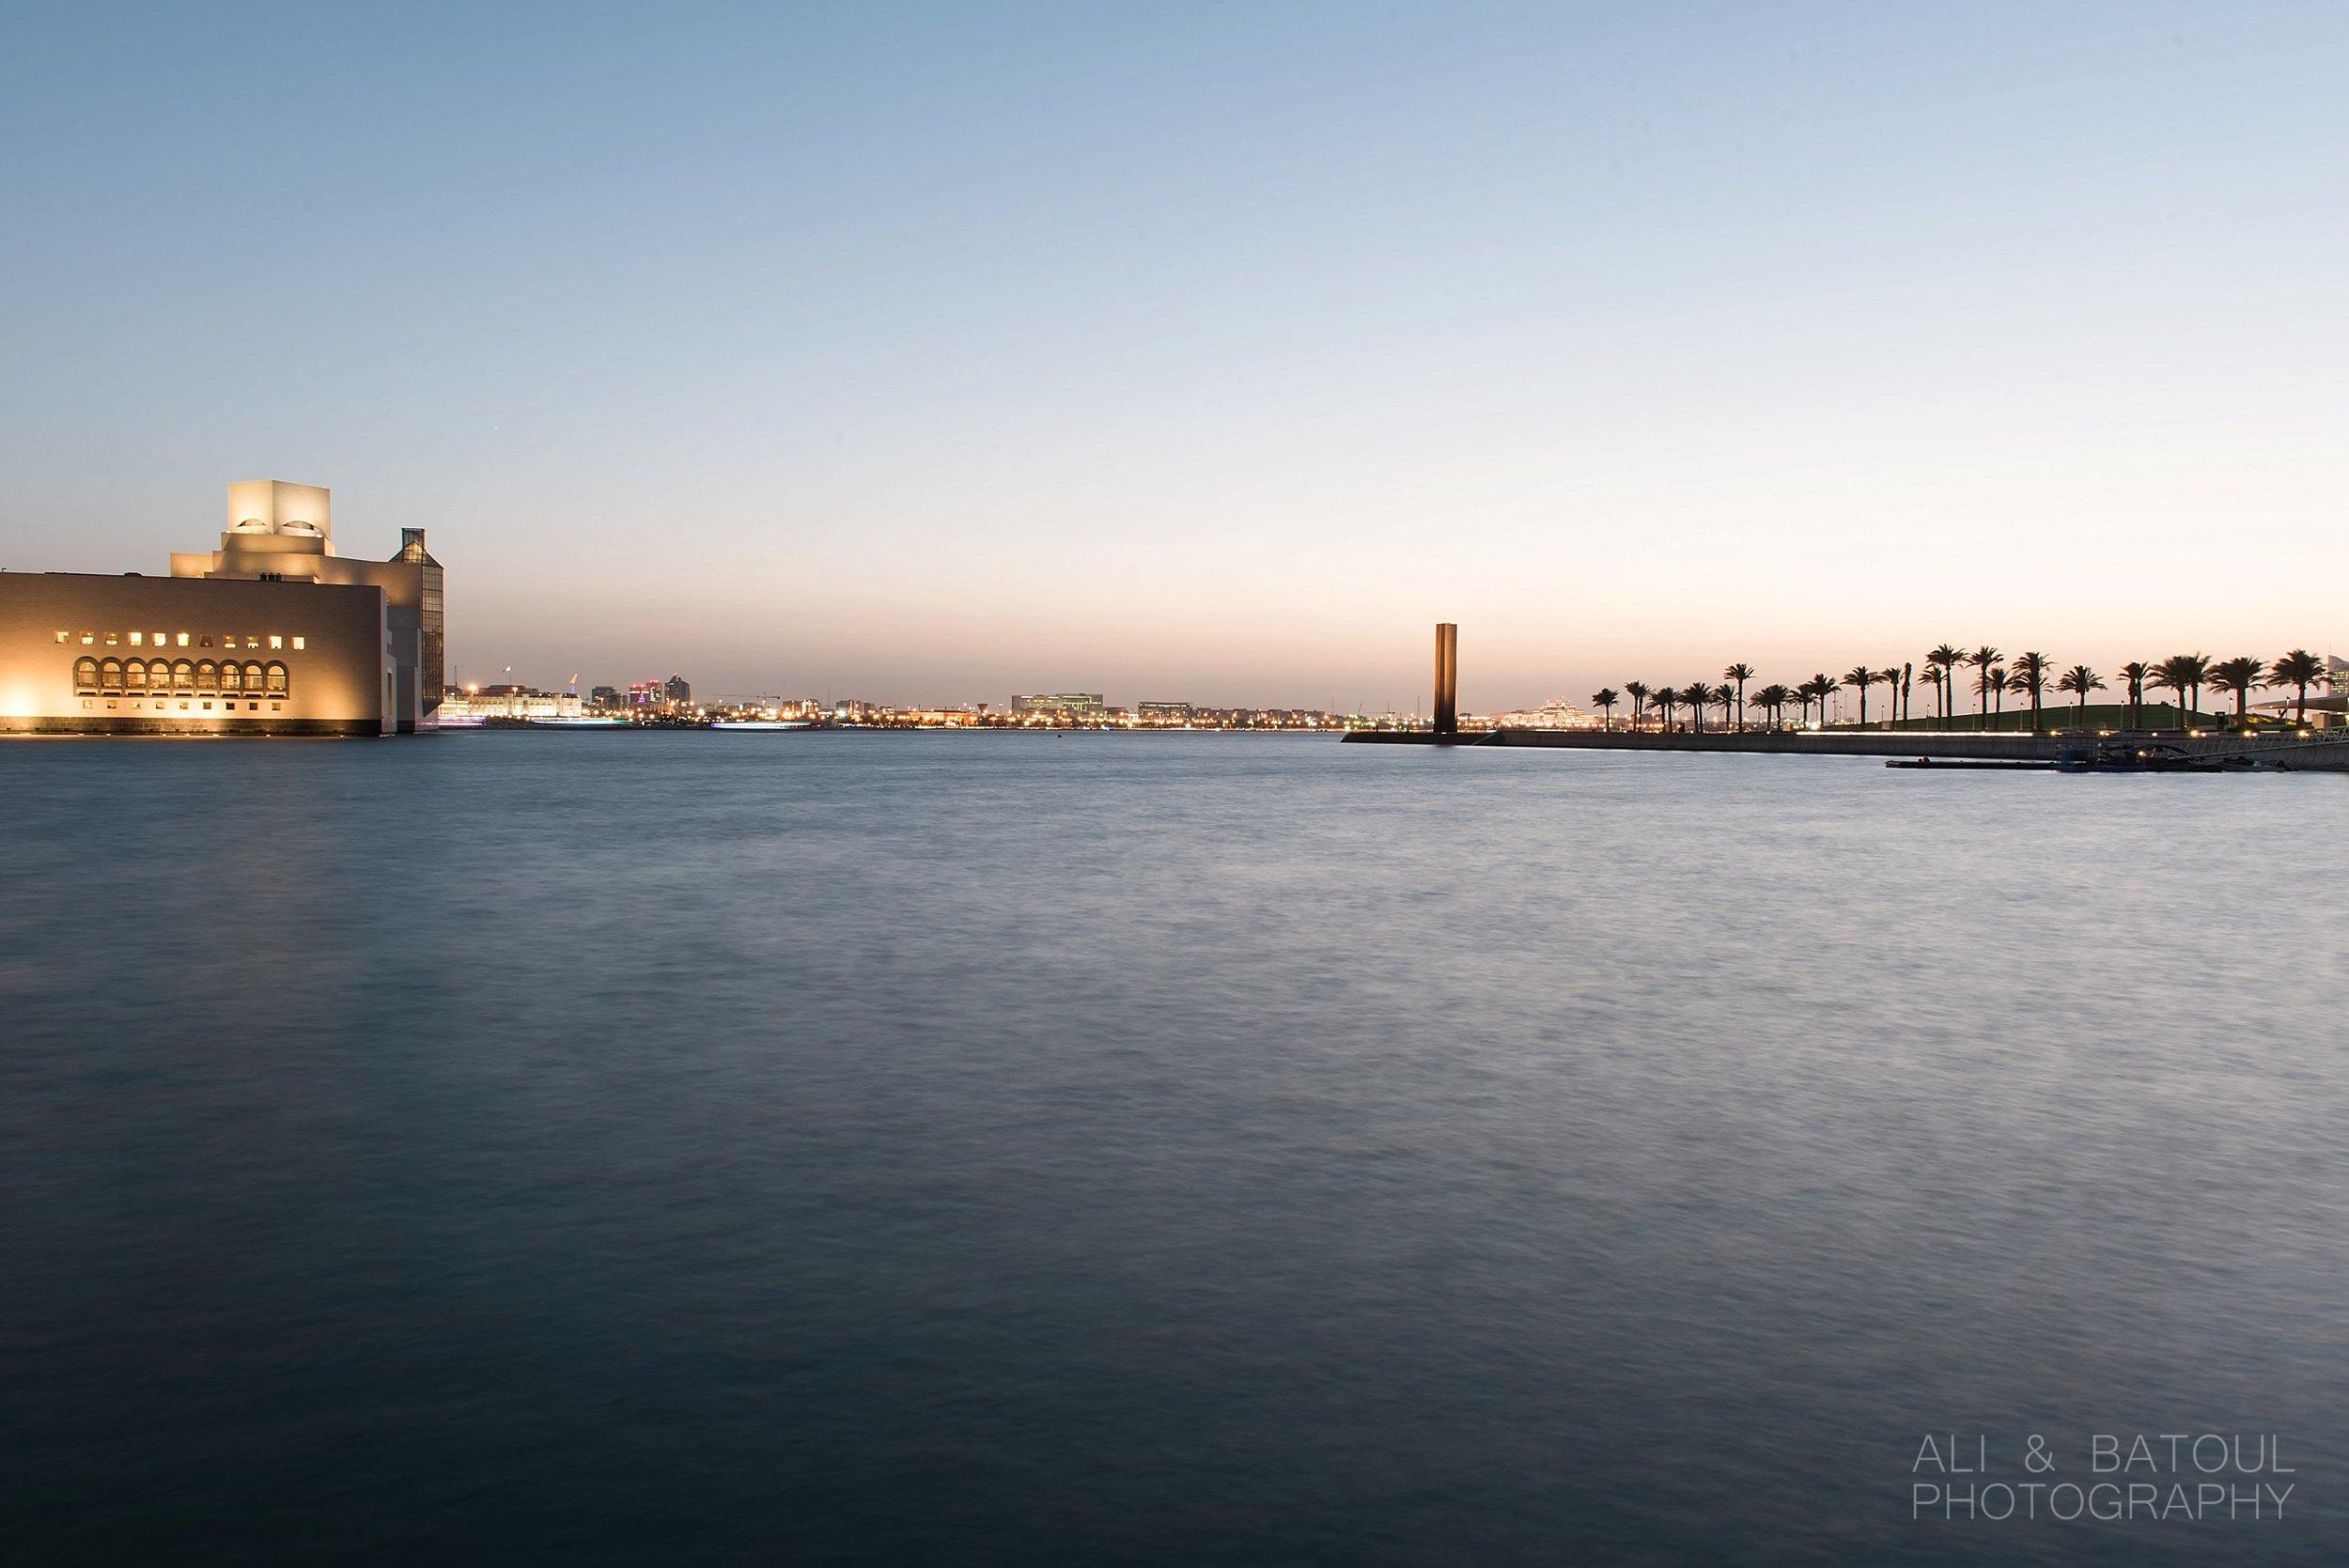 Ali & Batoul Photography - Doha Travel Photography_0056.jpg